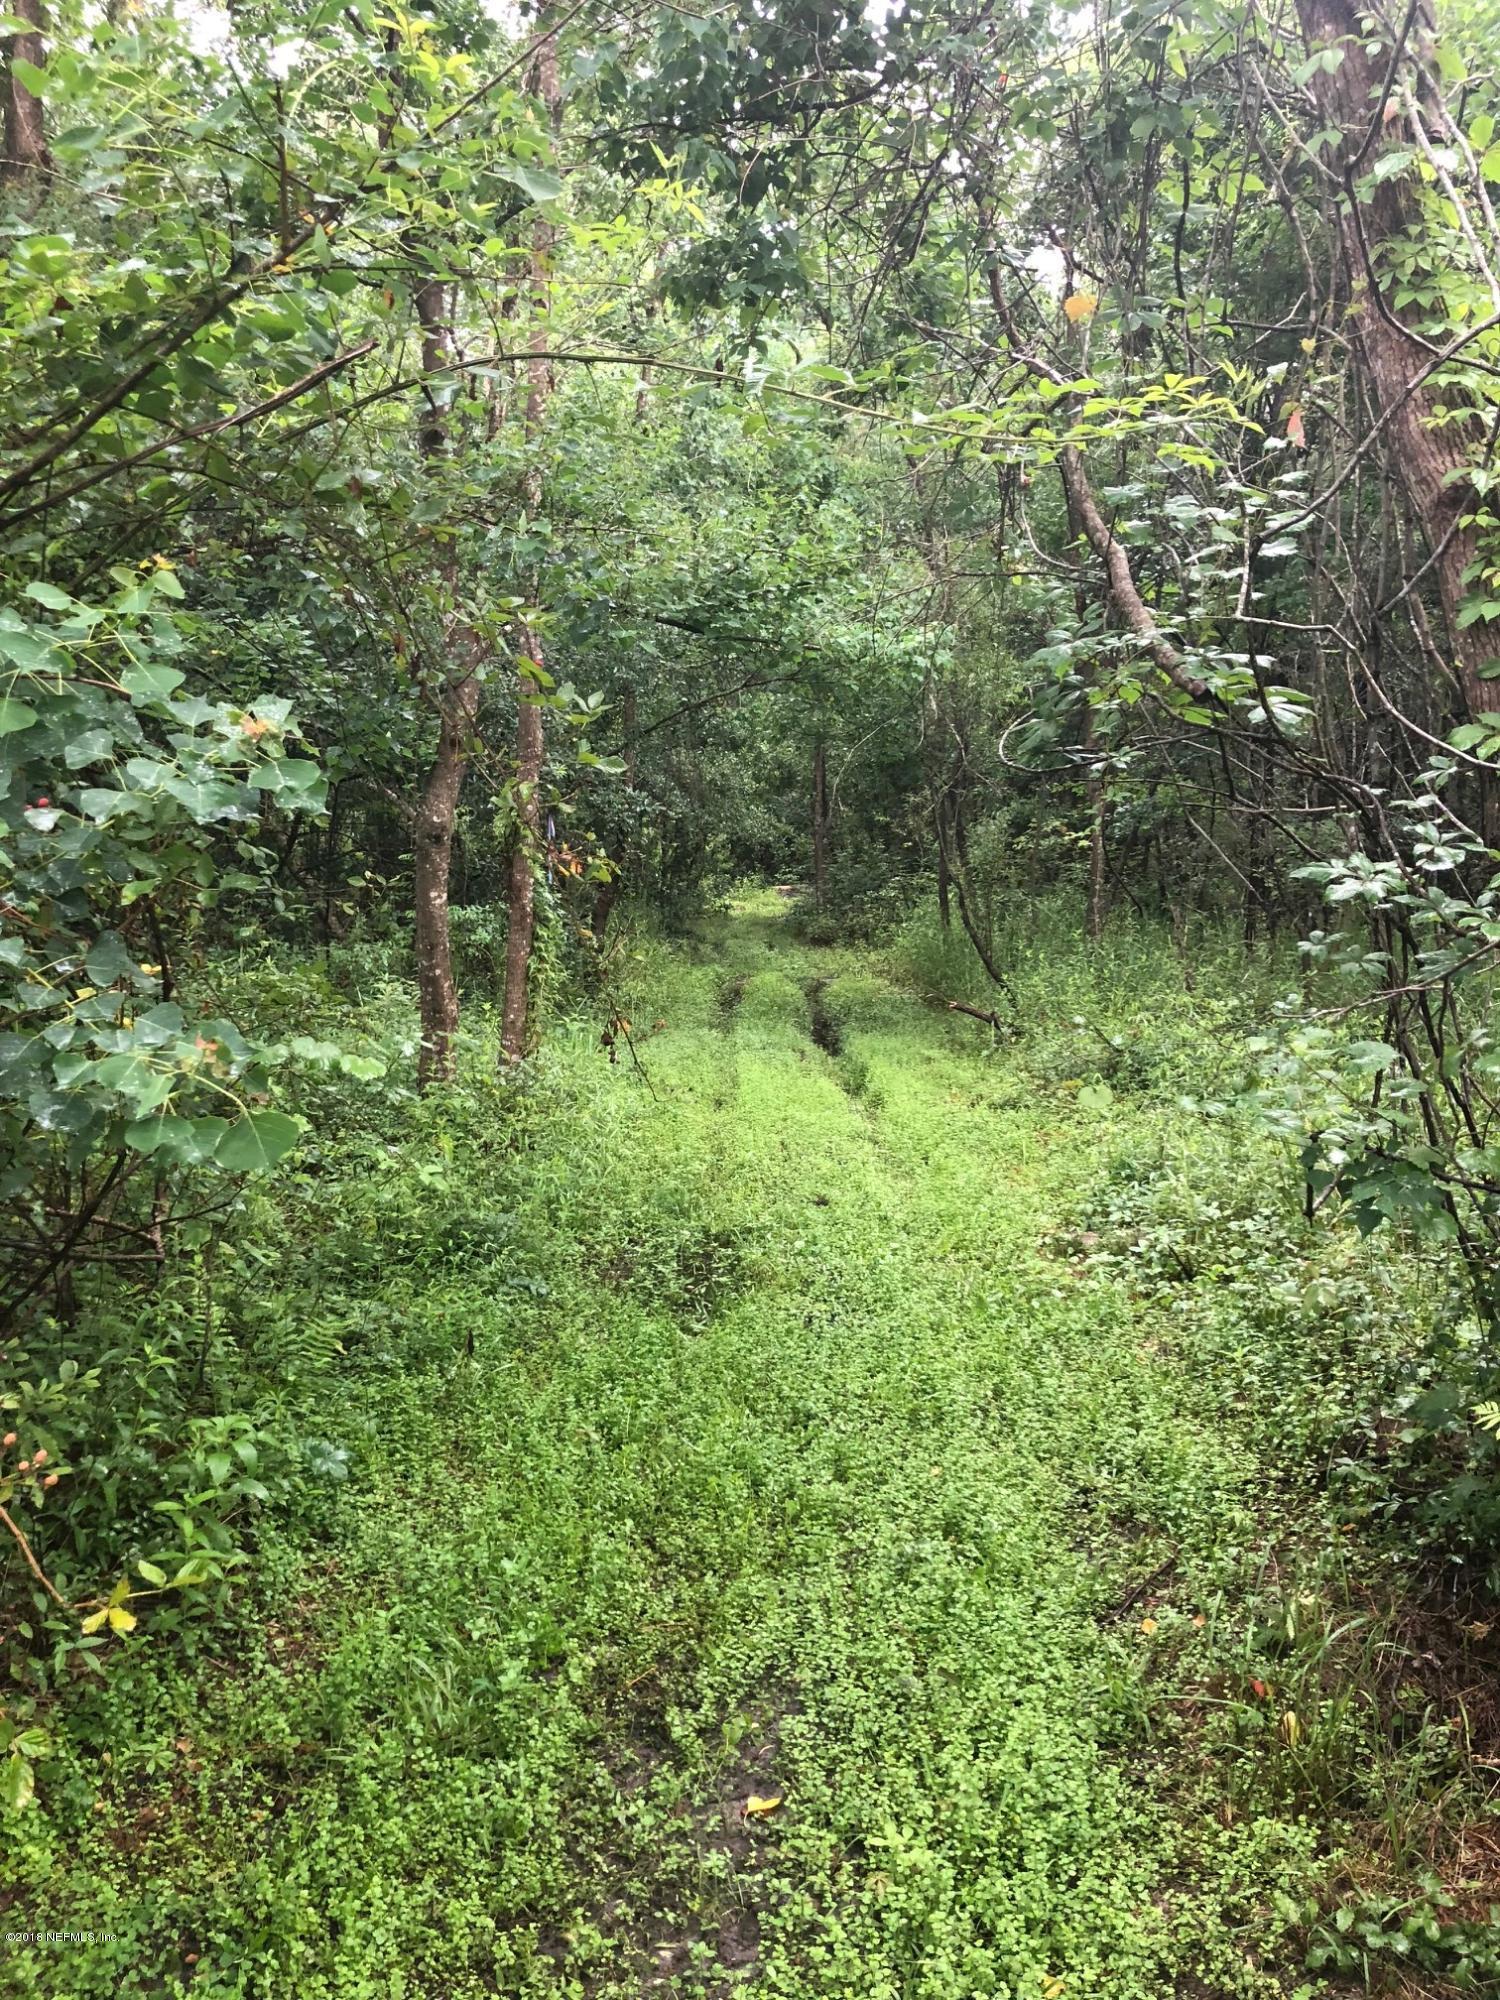 0 SUNRISE FARM, MIDDLEBURG, FLORIDA 32068, ,Vacant land,For sale,SUNRISE FARM,938869